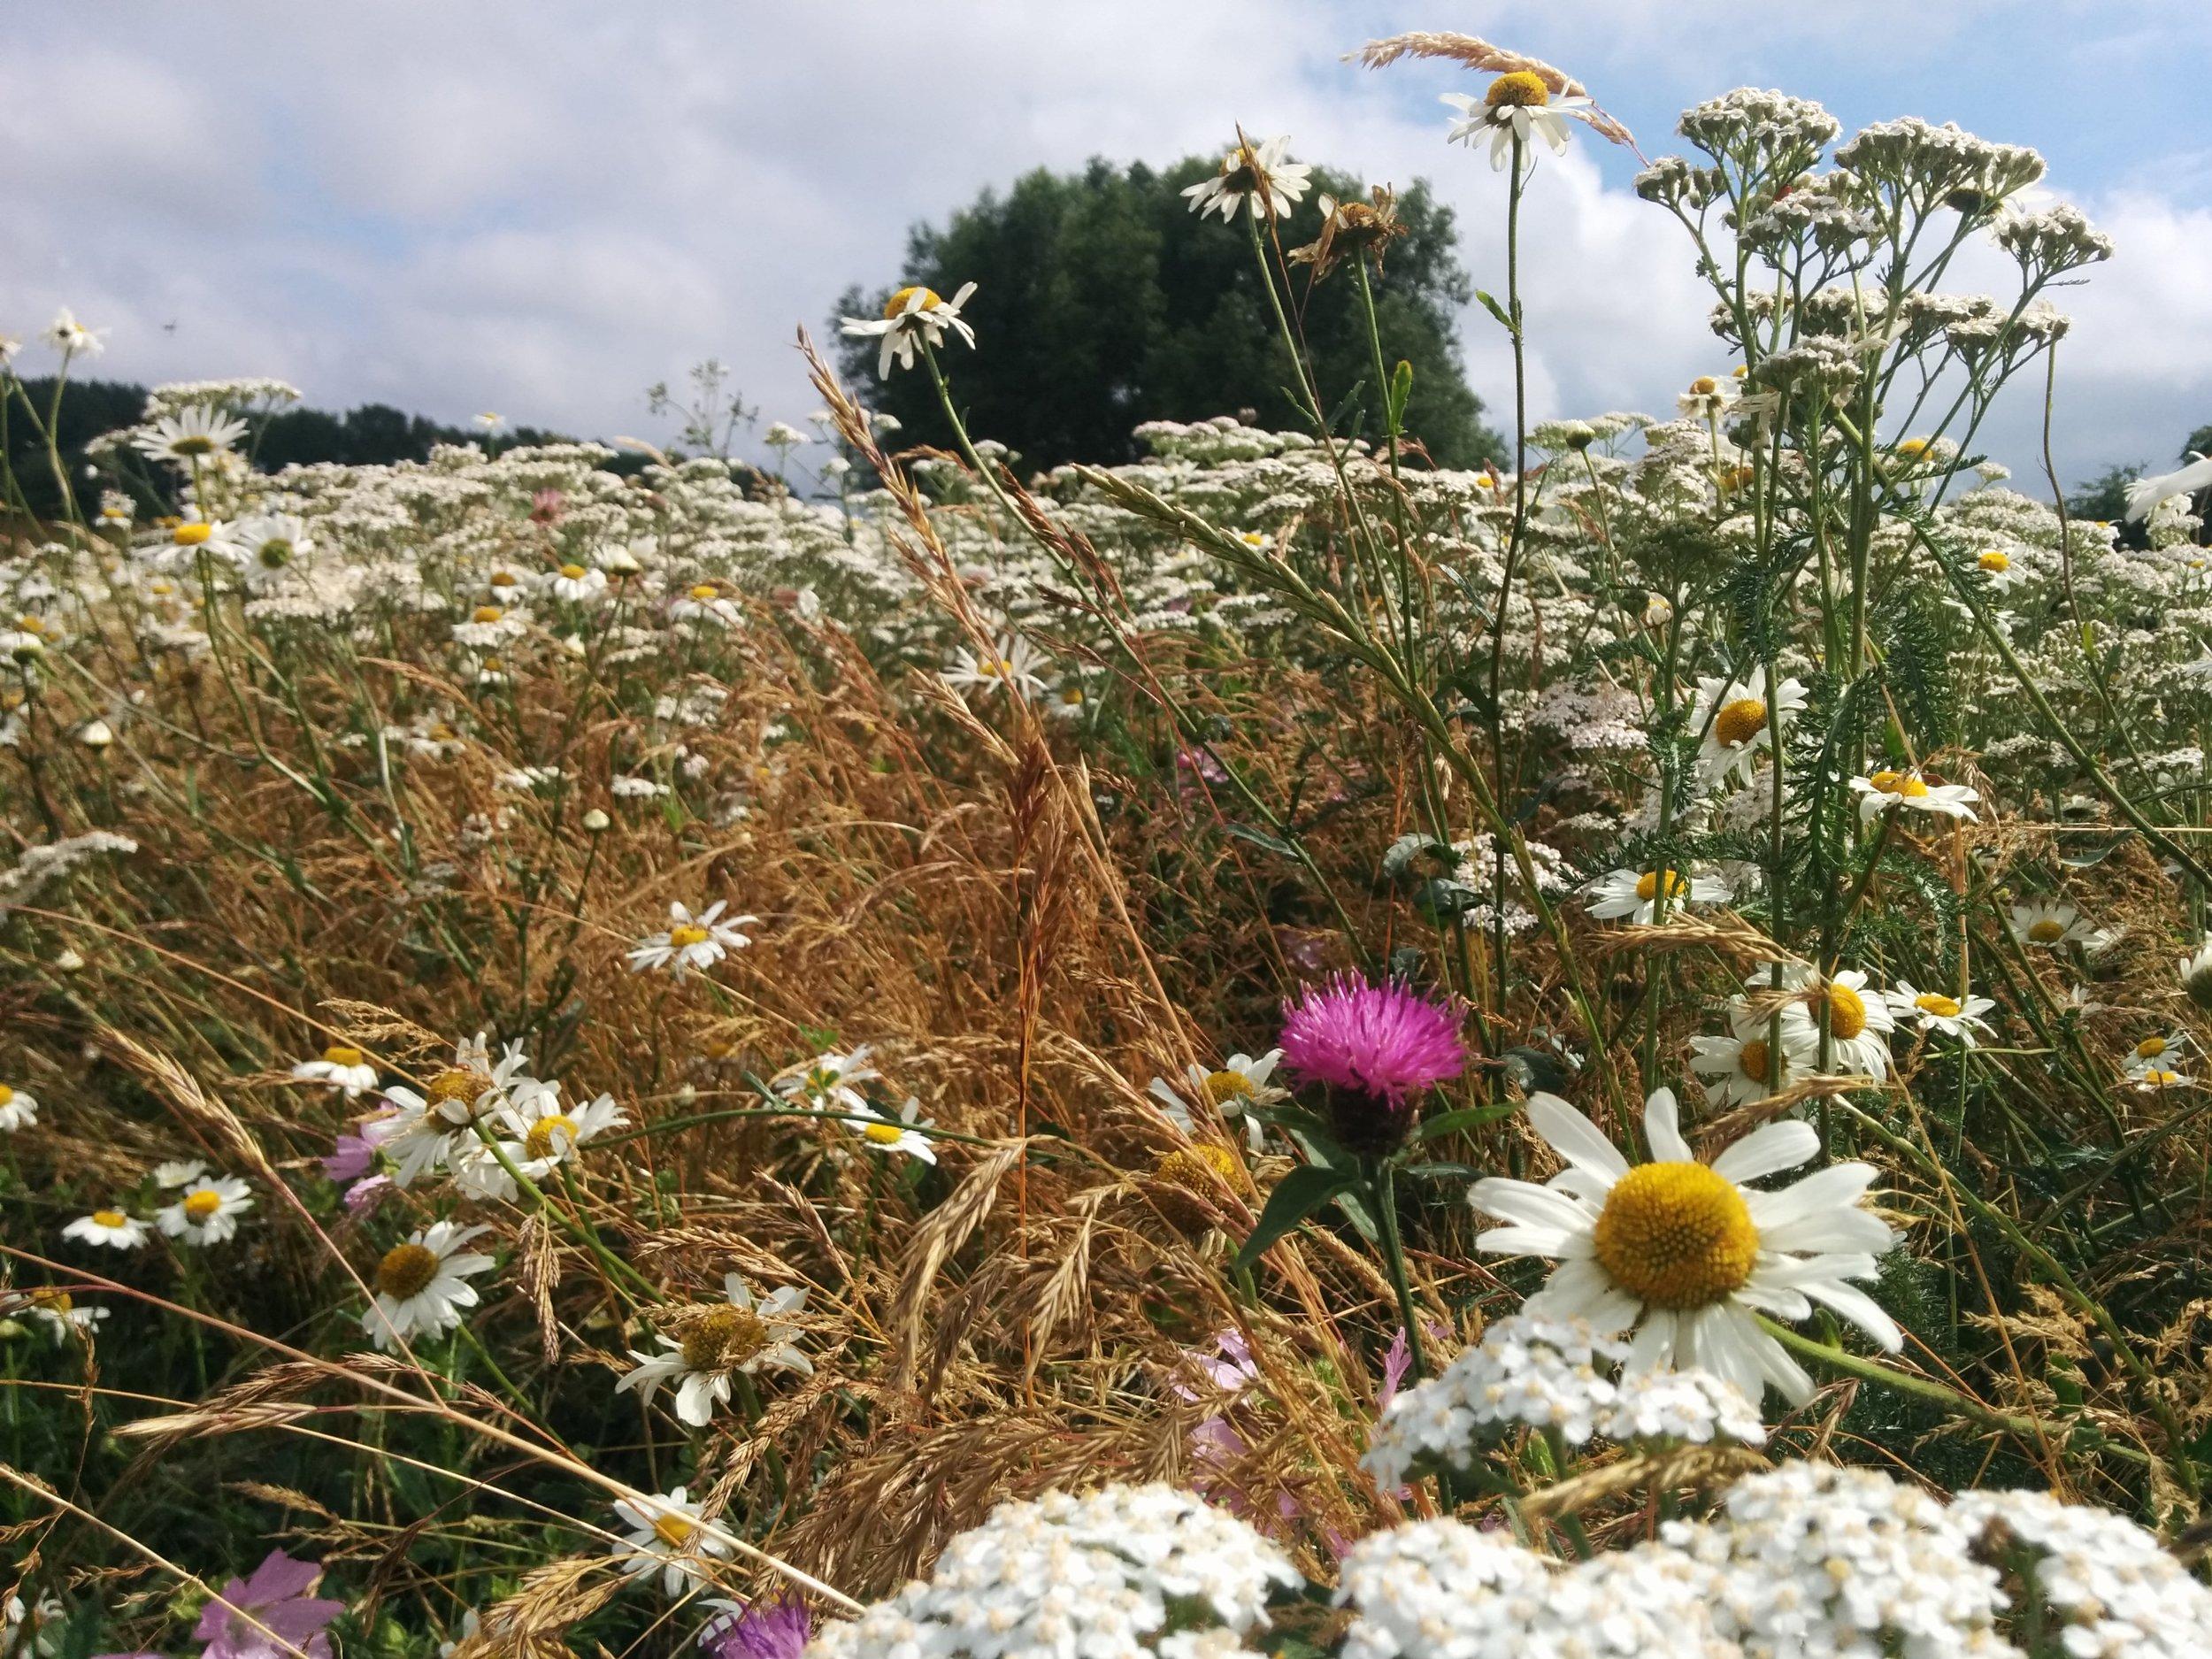 Chiltern wild flower meadow